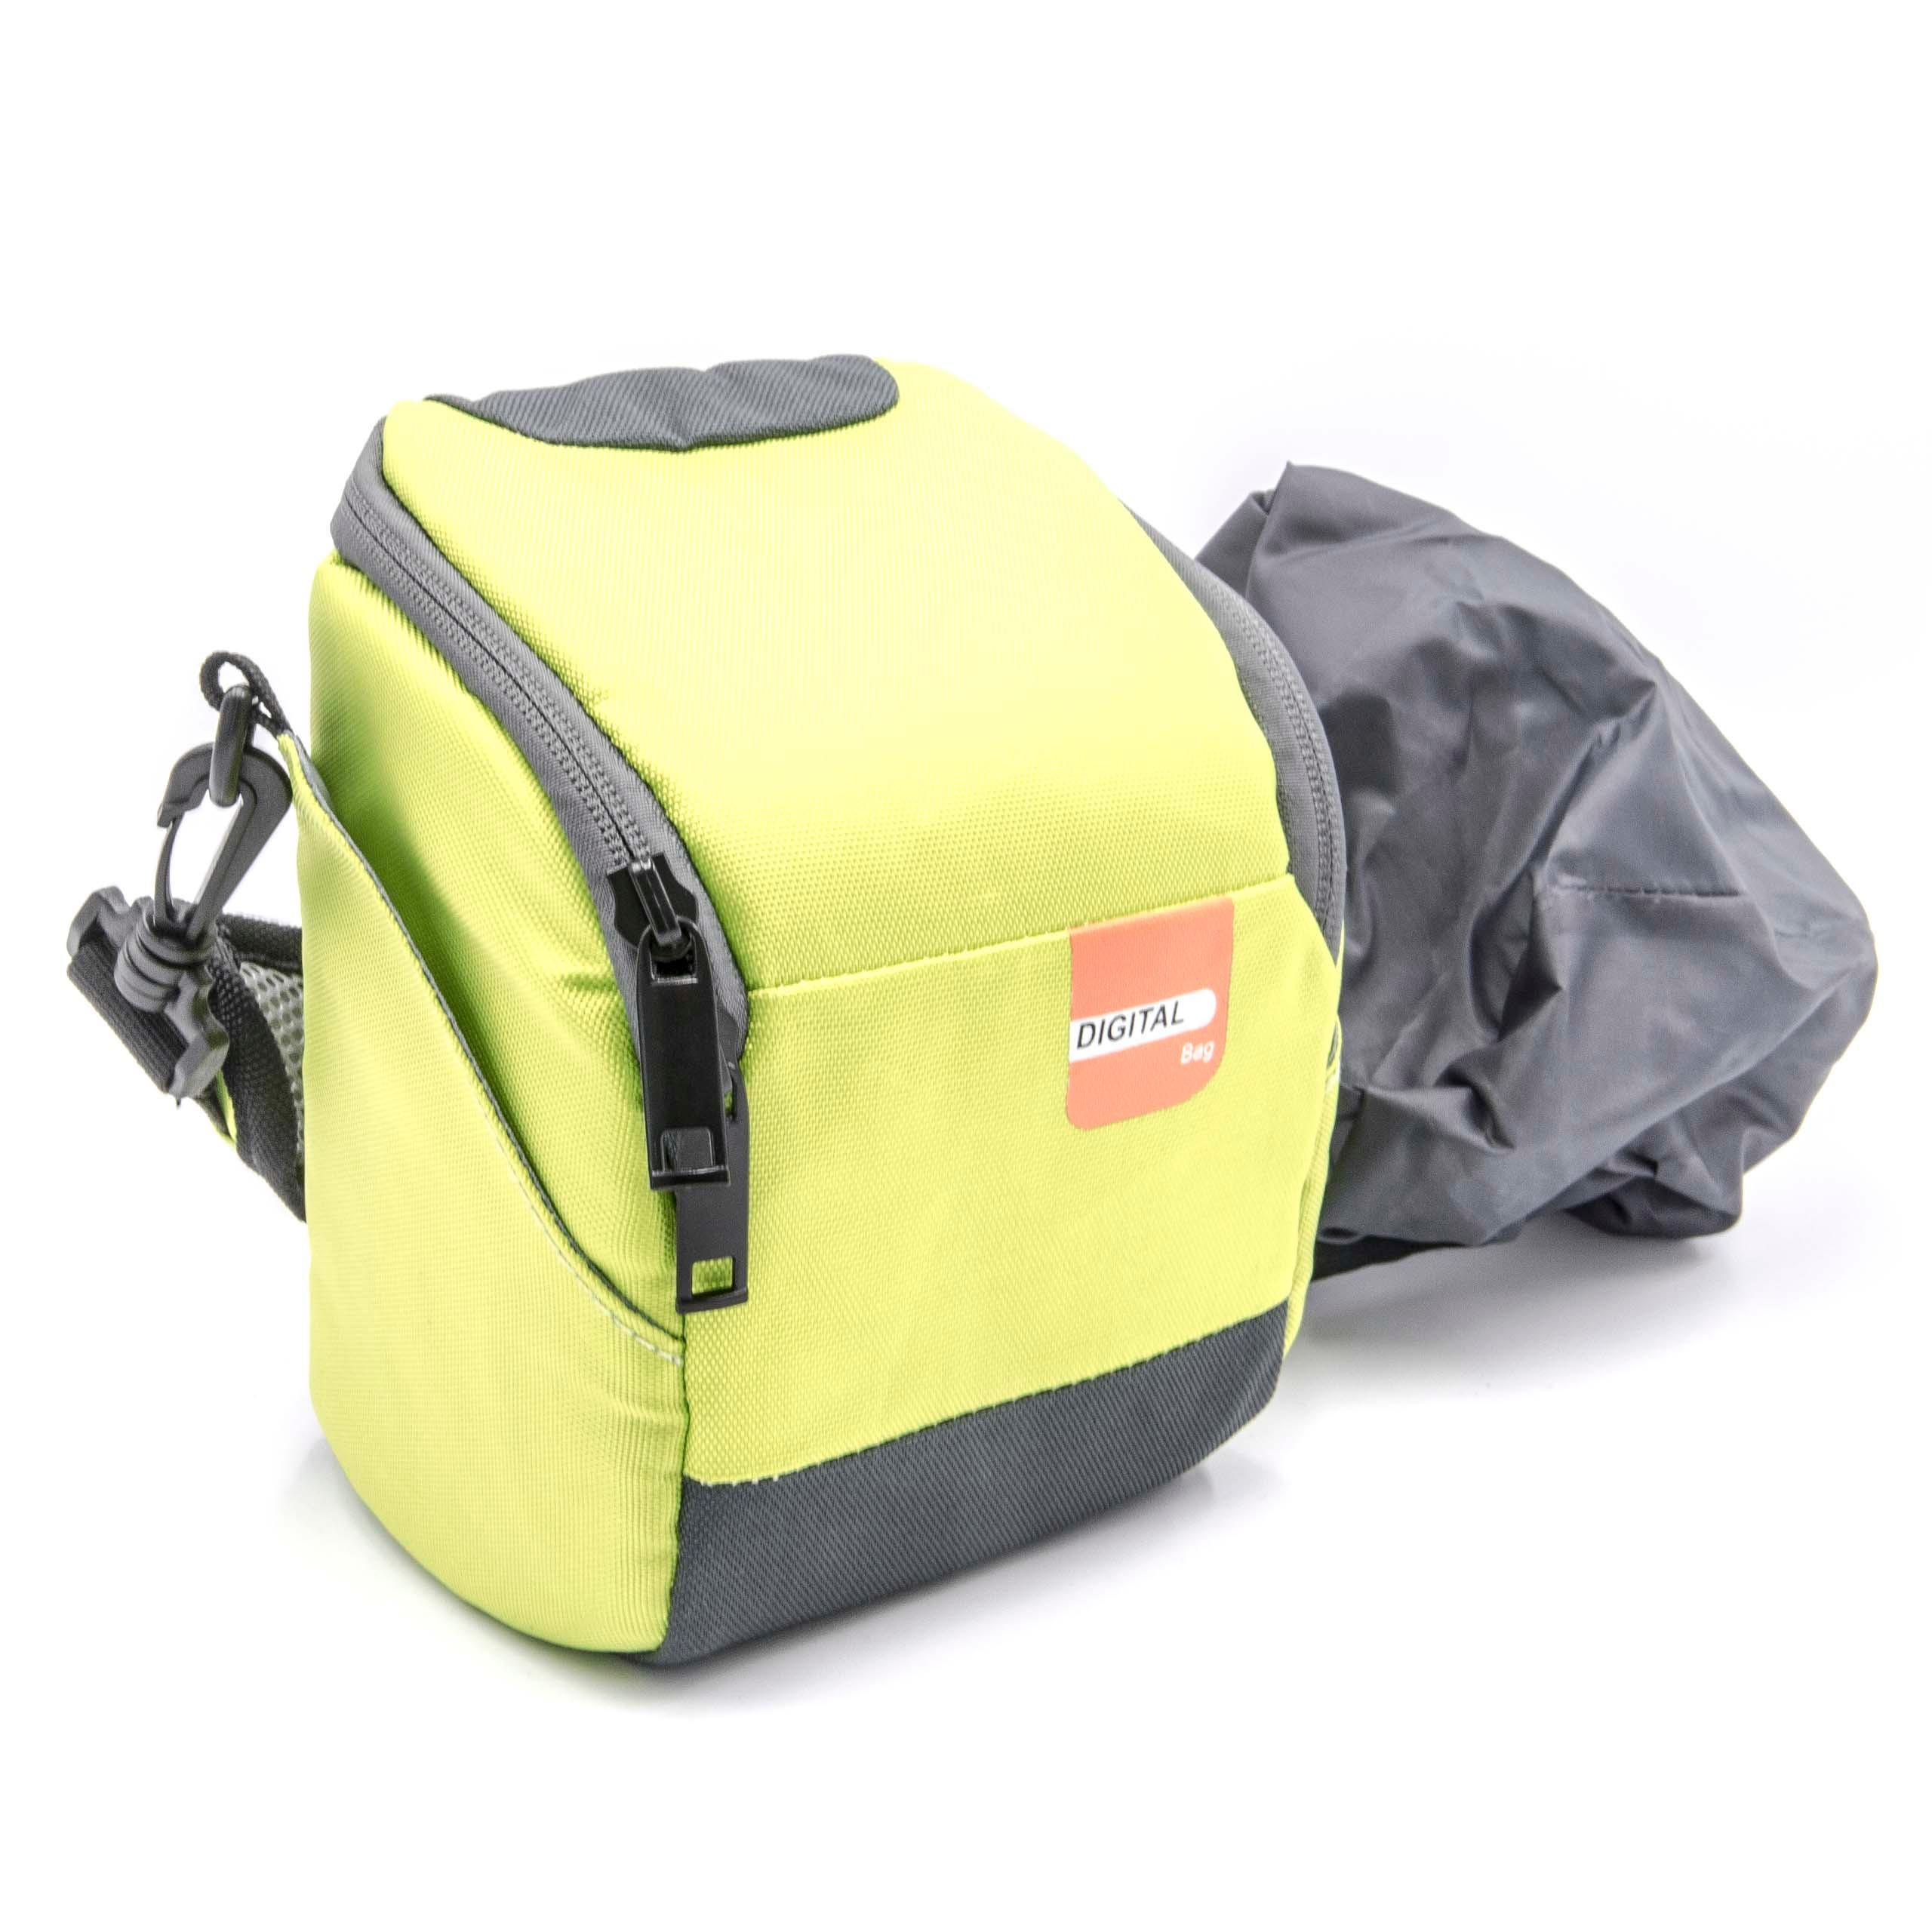 hdr-cx405 Estuche negro verde para Sony hdr-cx625 hdr-cx450